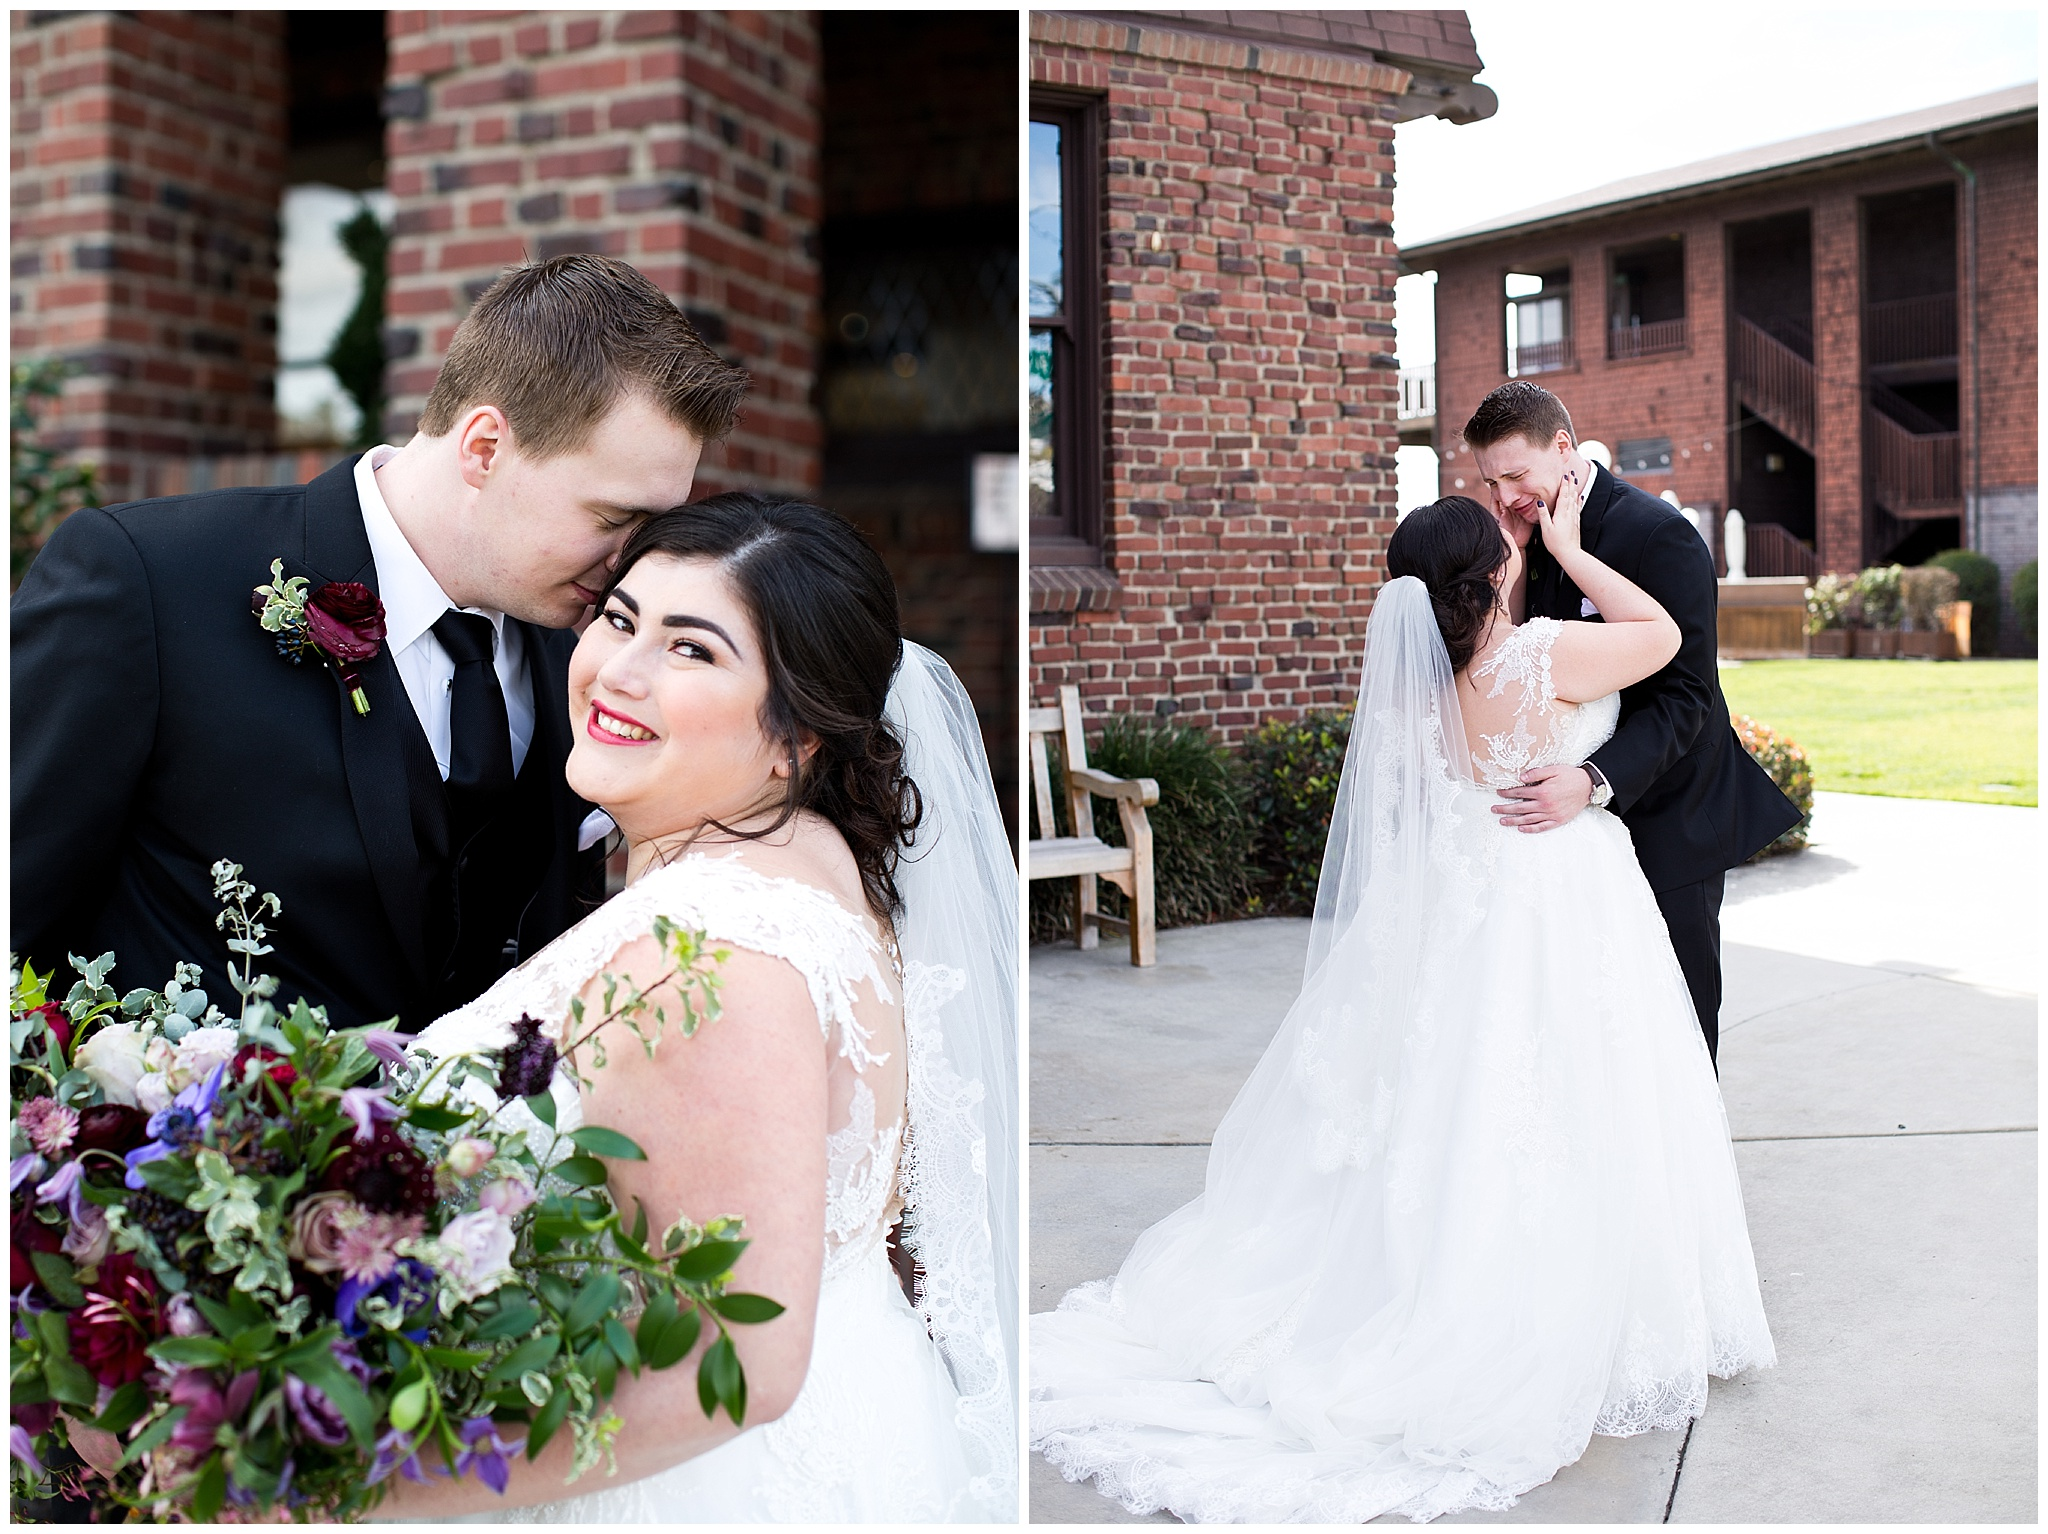 Carol_and_Grant_Wedding_3-3-18-7385.jpg